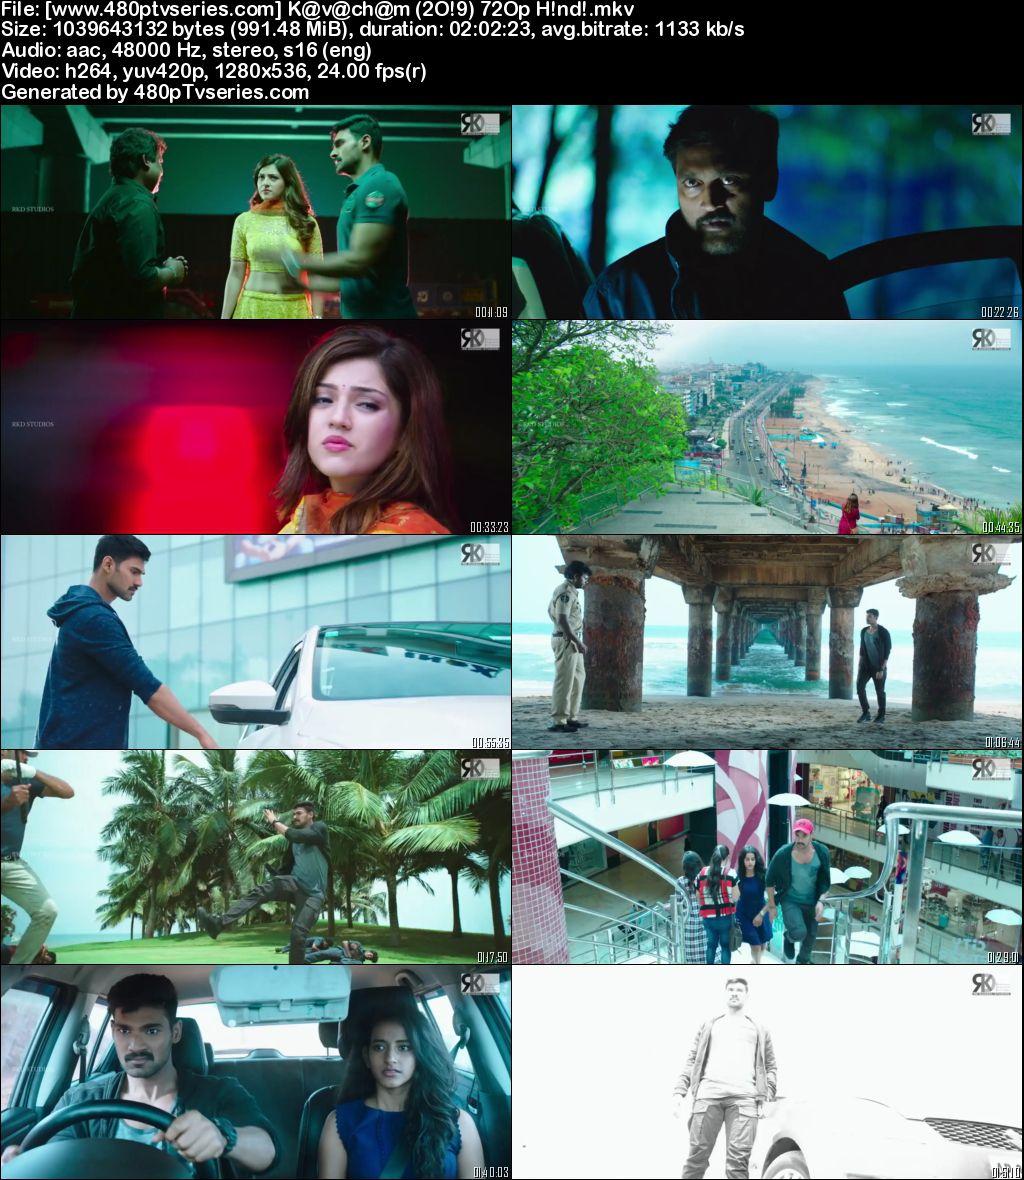 Download Inspector Vijay (Kavacham) (2019) 1GB Full Hindi Dubbed Movie Download 720p HDRip Free Watch Online Full Movie Download Worldfree4u 9xmovies